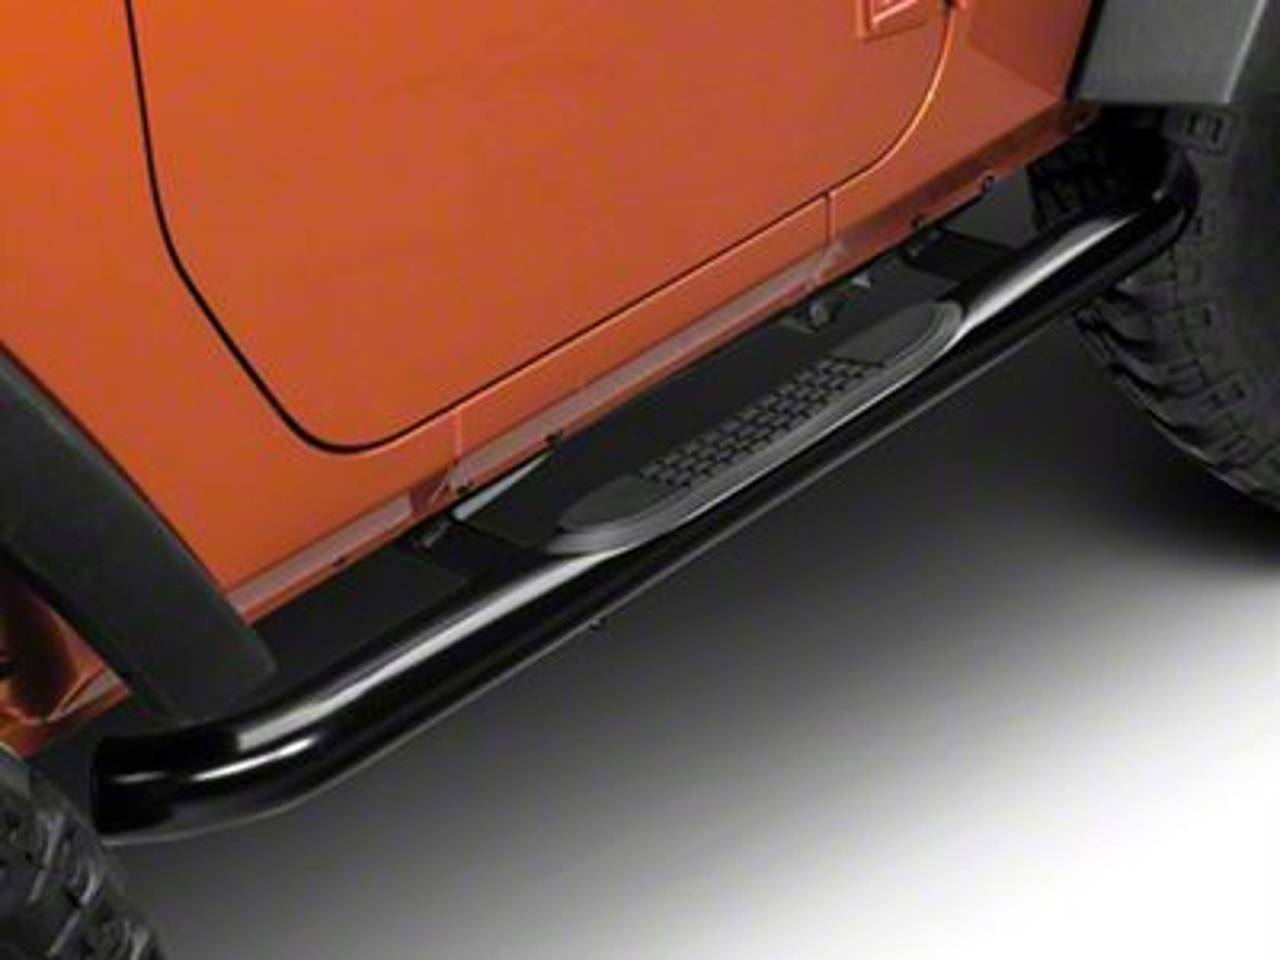 RedRock 4x4 3 in. Round Curved Side Step Bars - Gloss Black (07-18 Jeep Wrangler JK 2 Door)